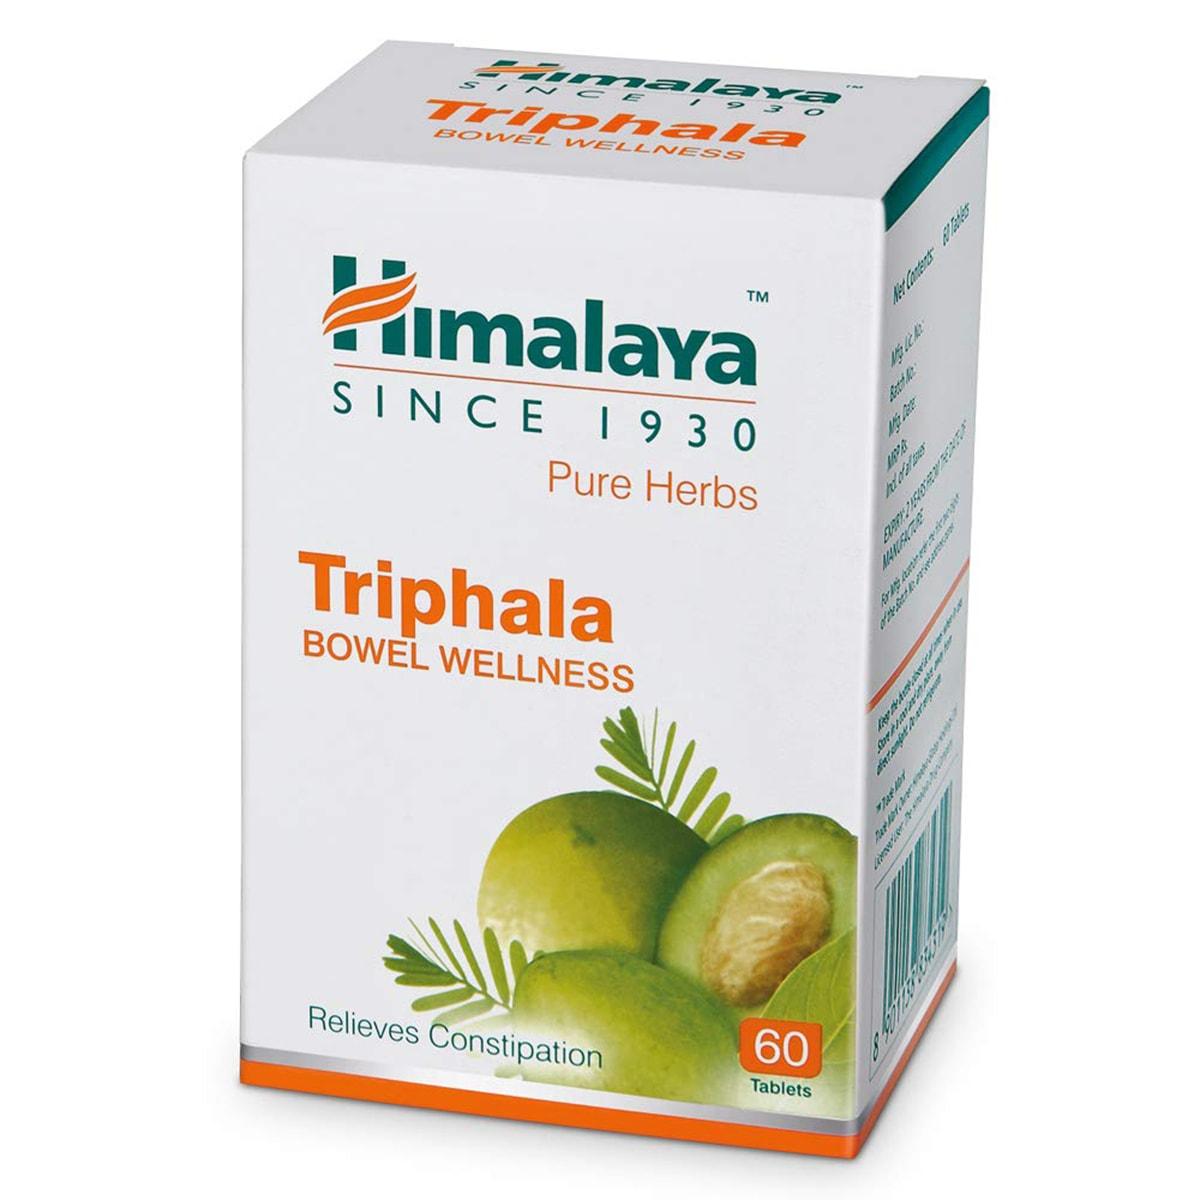 Buy Himalaya Herbals Triphala - 60 Tablets